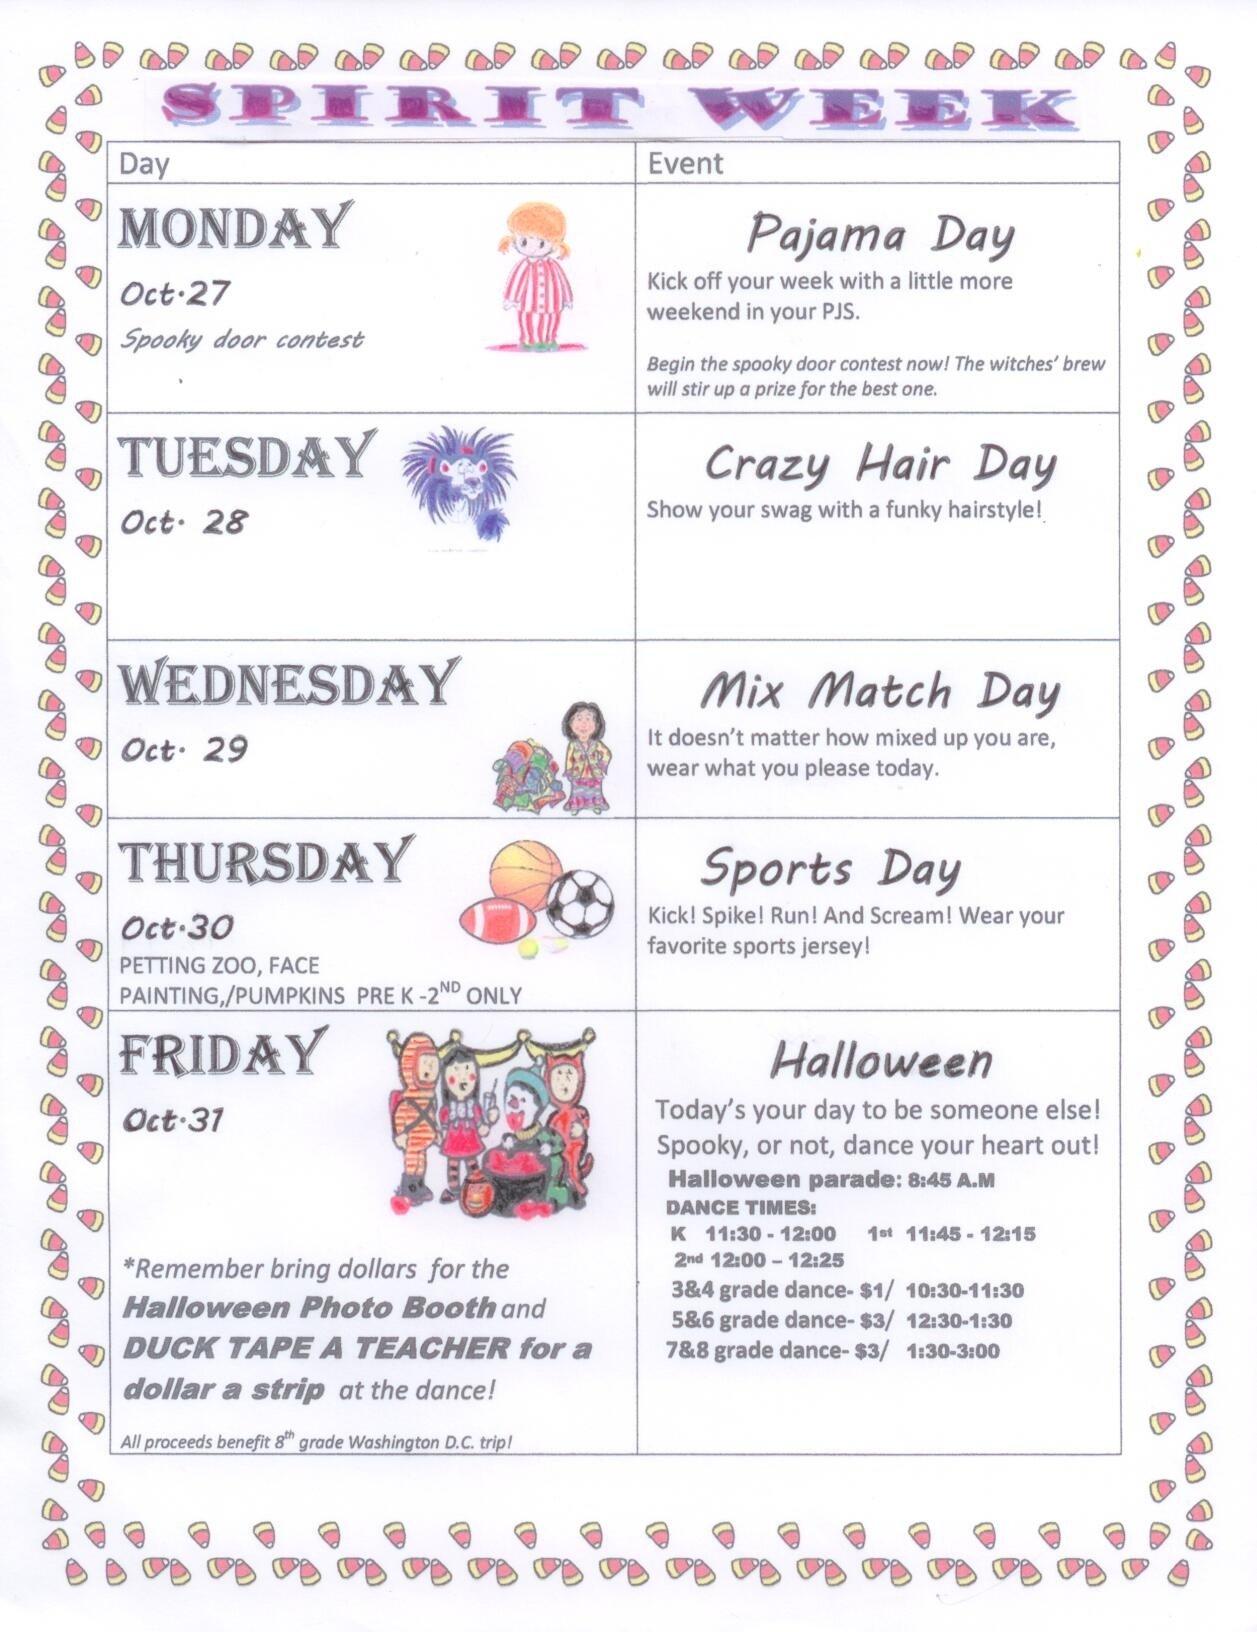 10 Most Recommended Spirit Week Ideas For Elementary School spirit week for preschool google search preschool spirit week 2020